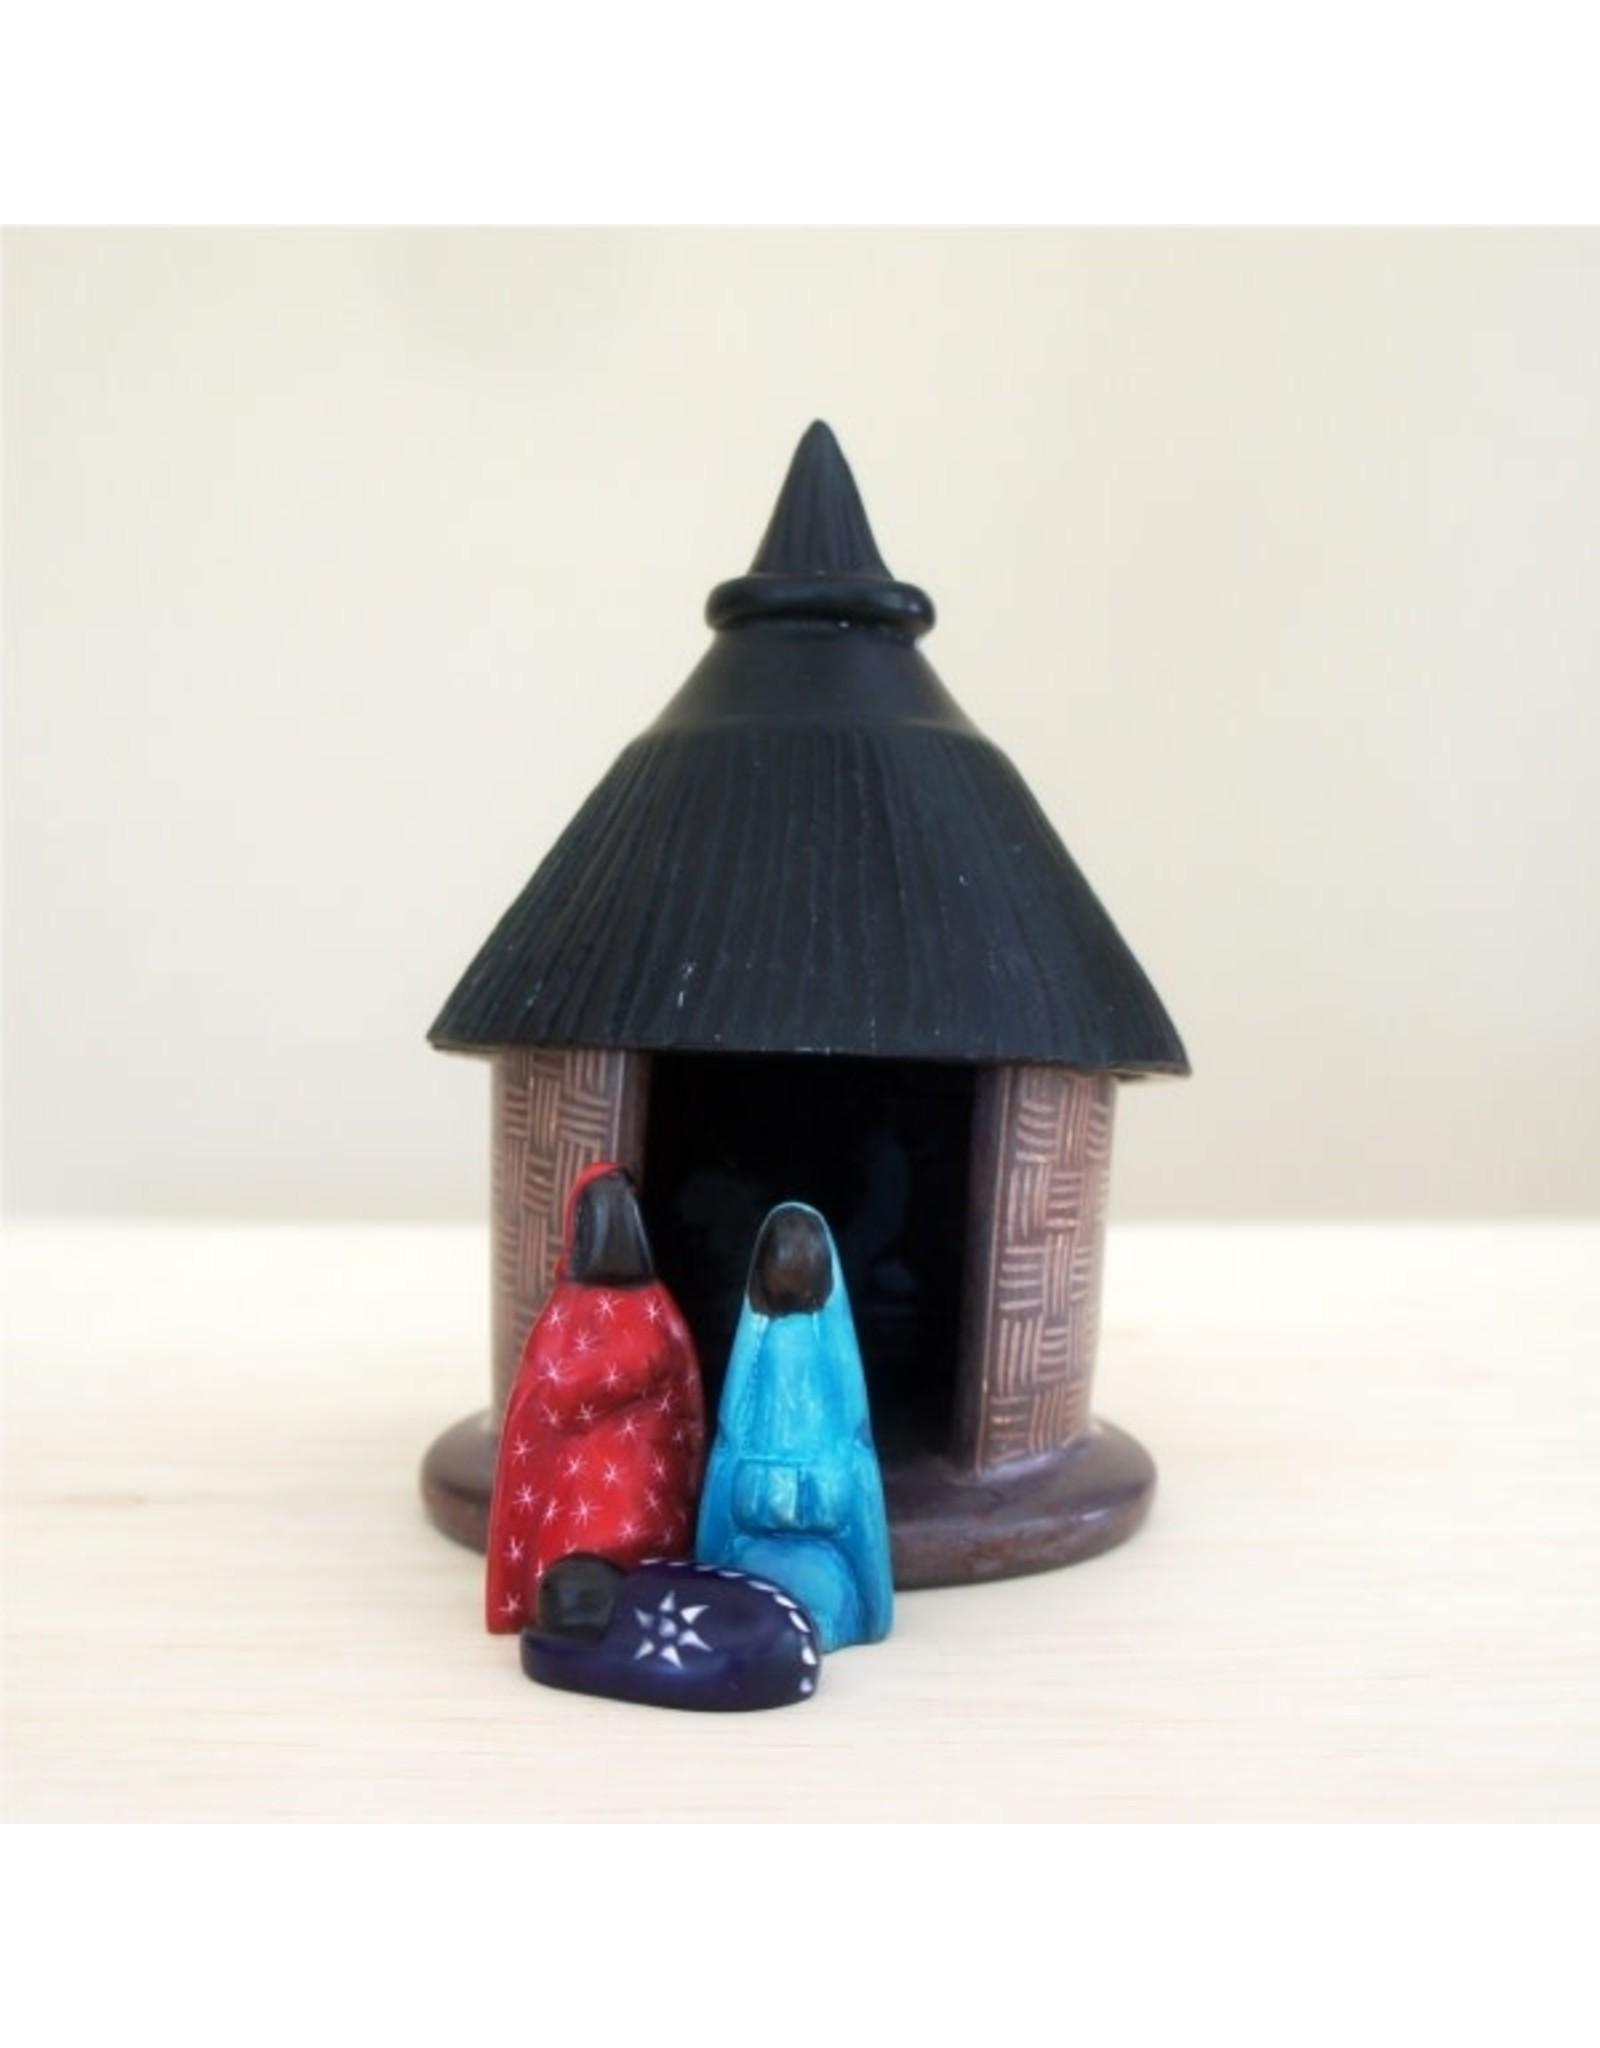 Venture Imports Colourful Kisii Stone Hut Nativity, 5pcs. Kenya.